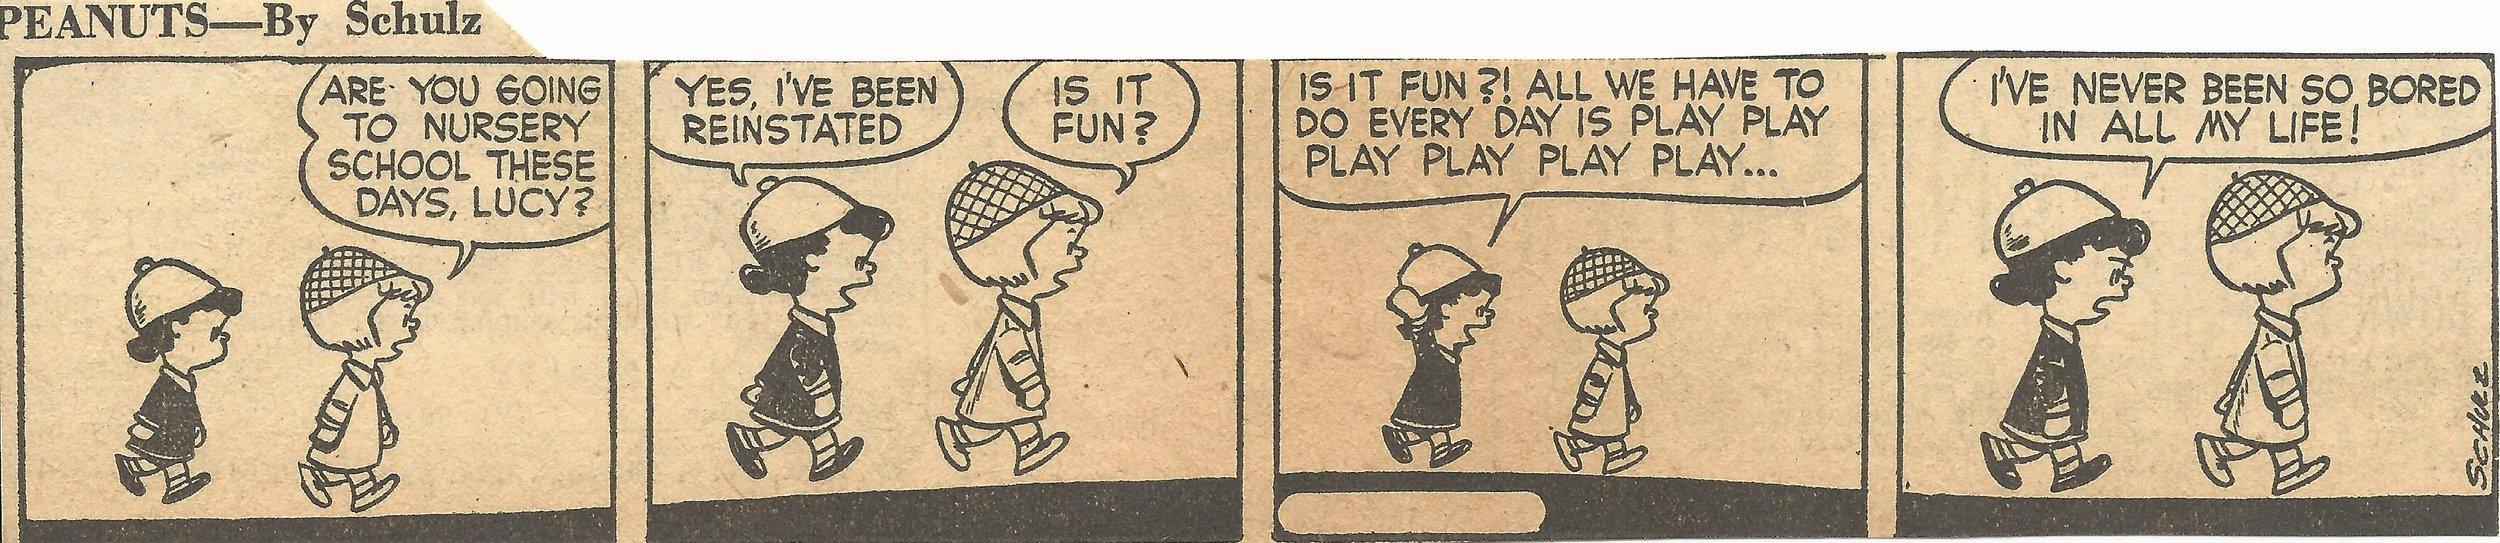 11. Jan. 21, 1953 (Oma)_Page_7 (3).jpg